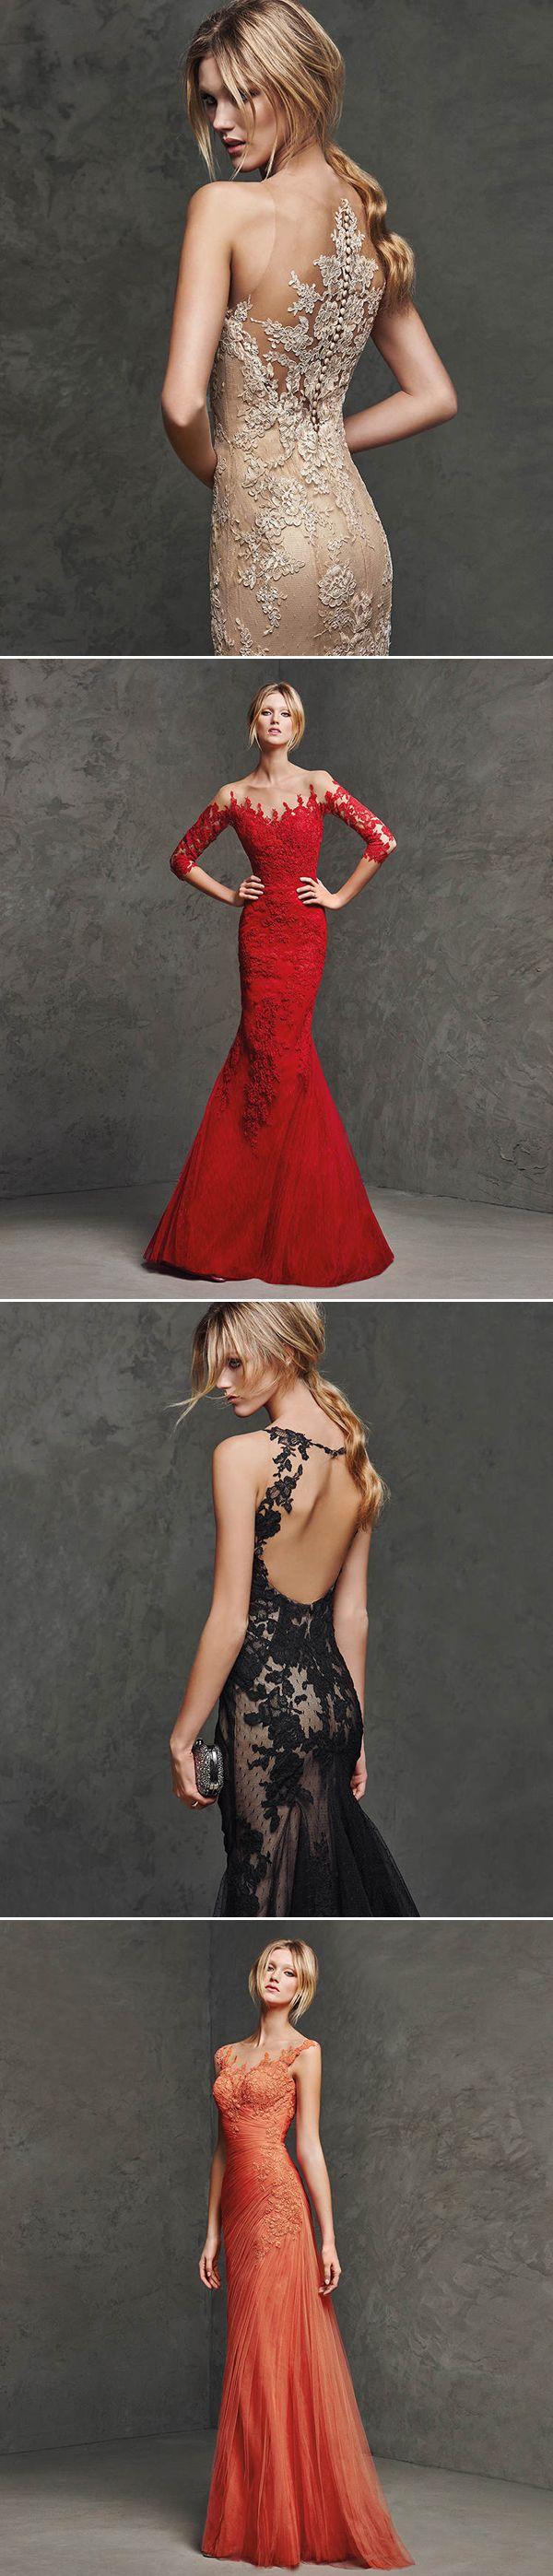 Dress to Impress! 32 Stunning Fashion-forward Reception Gowns – Pronovias!